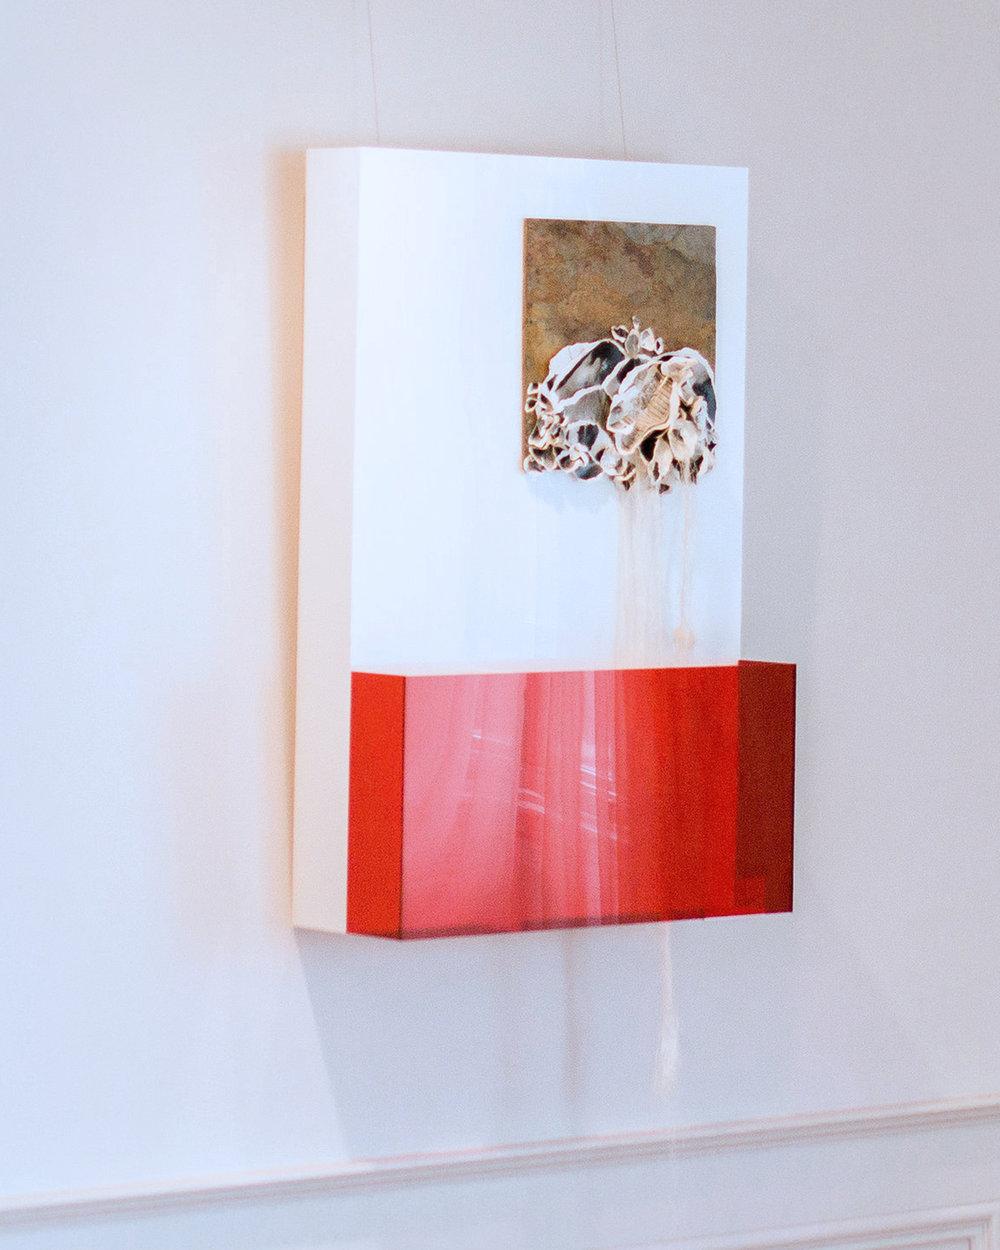 Jeremiah Morris - _Permeations_ - 3_x4_ - Silver gelatin prints, slate, acrylic, string, glue - 2017 - $2250.jpg